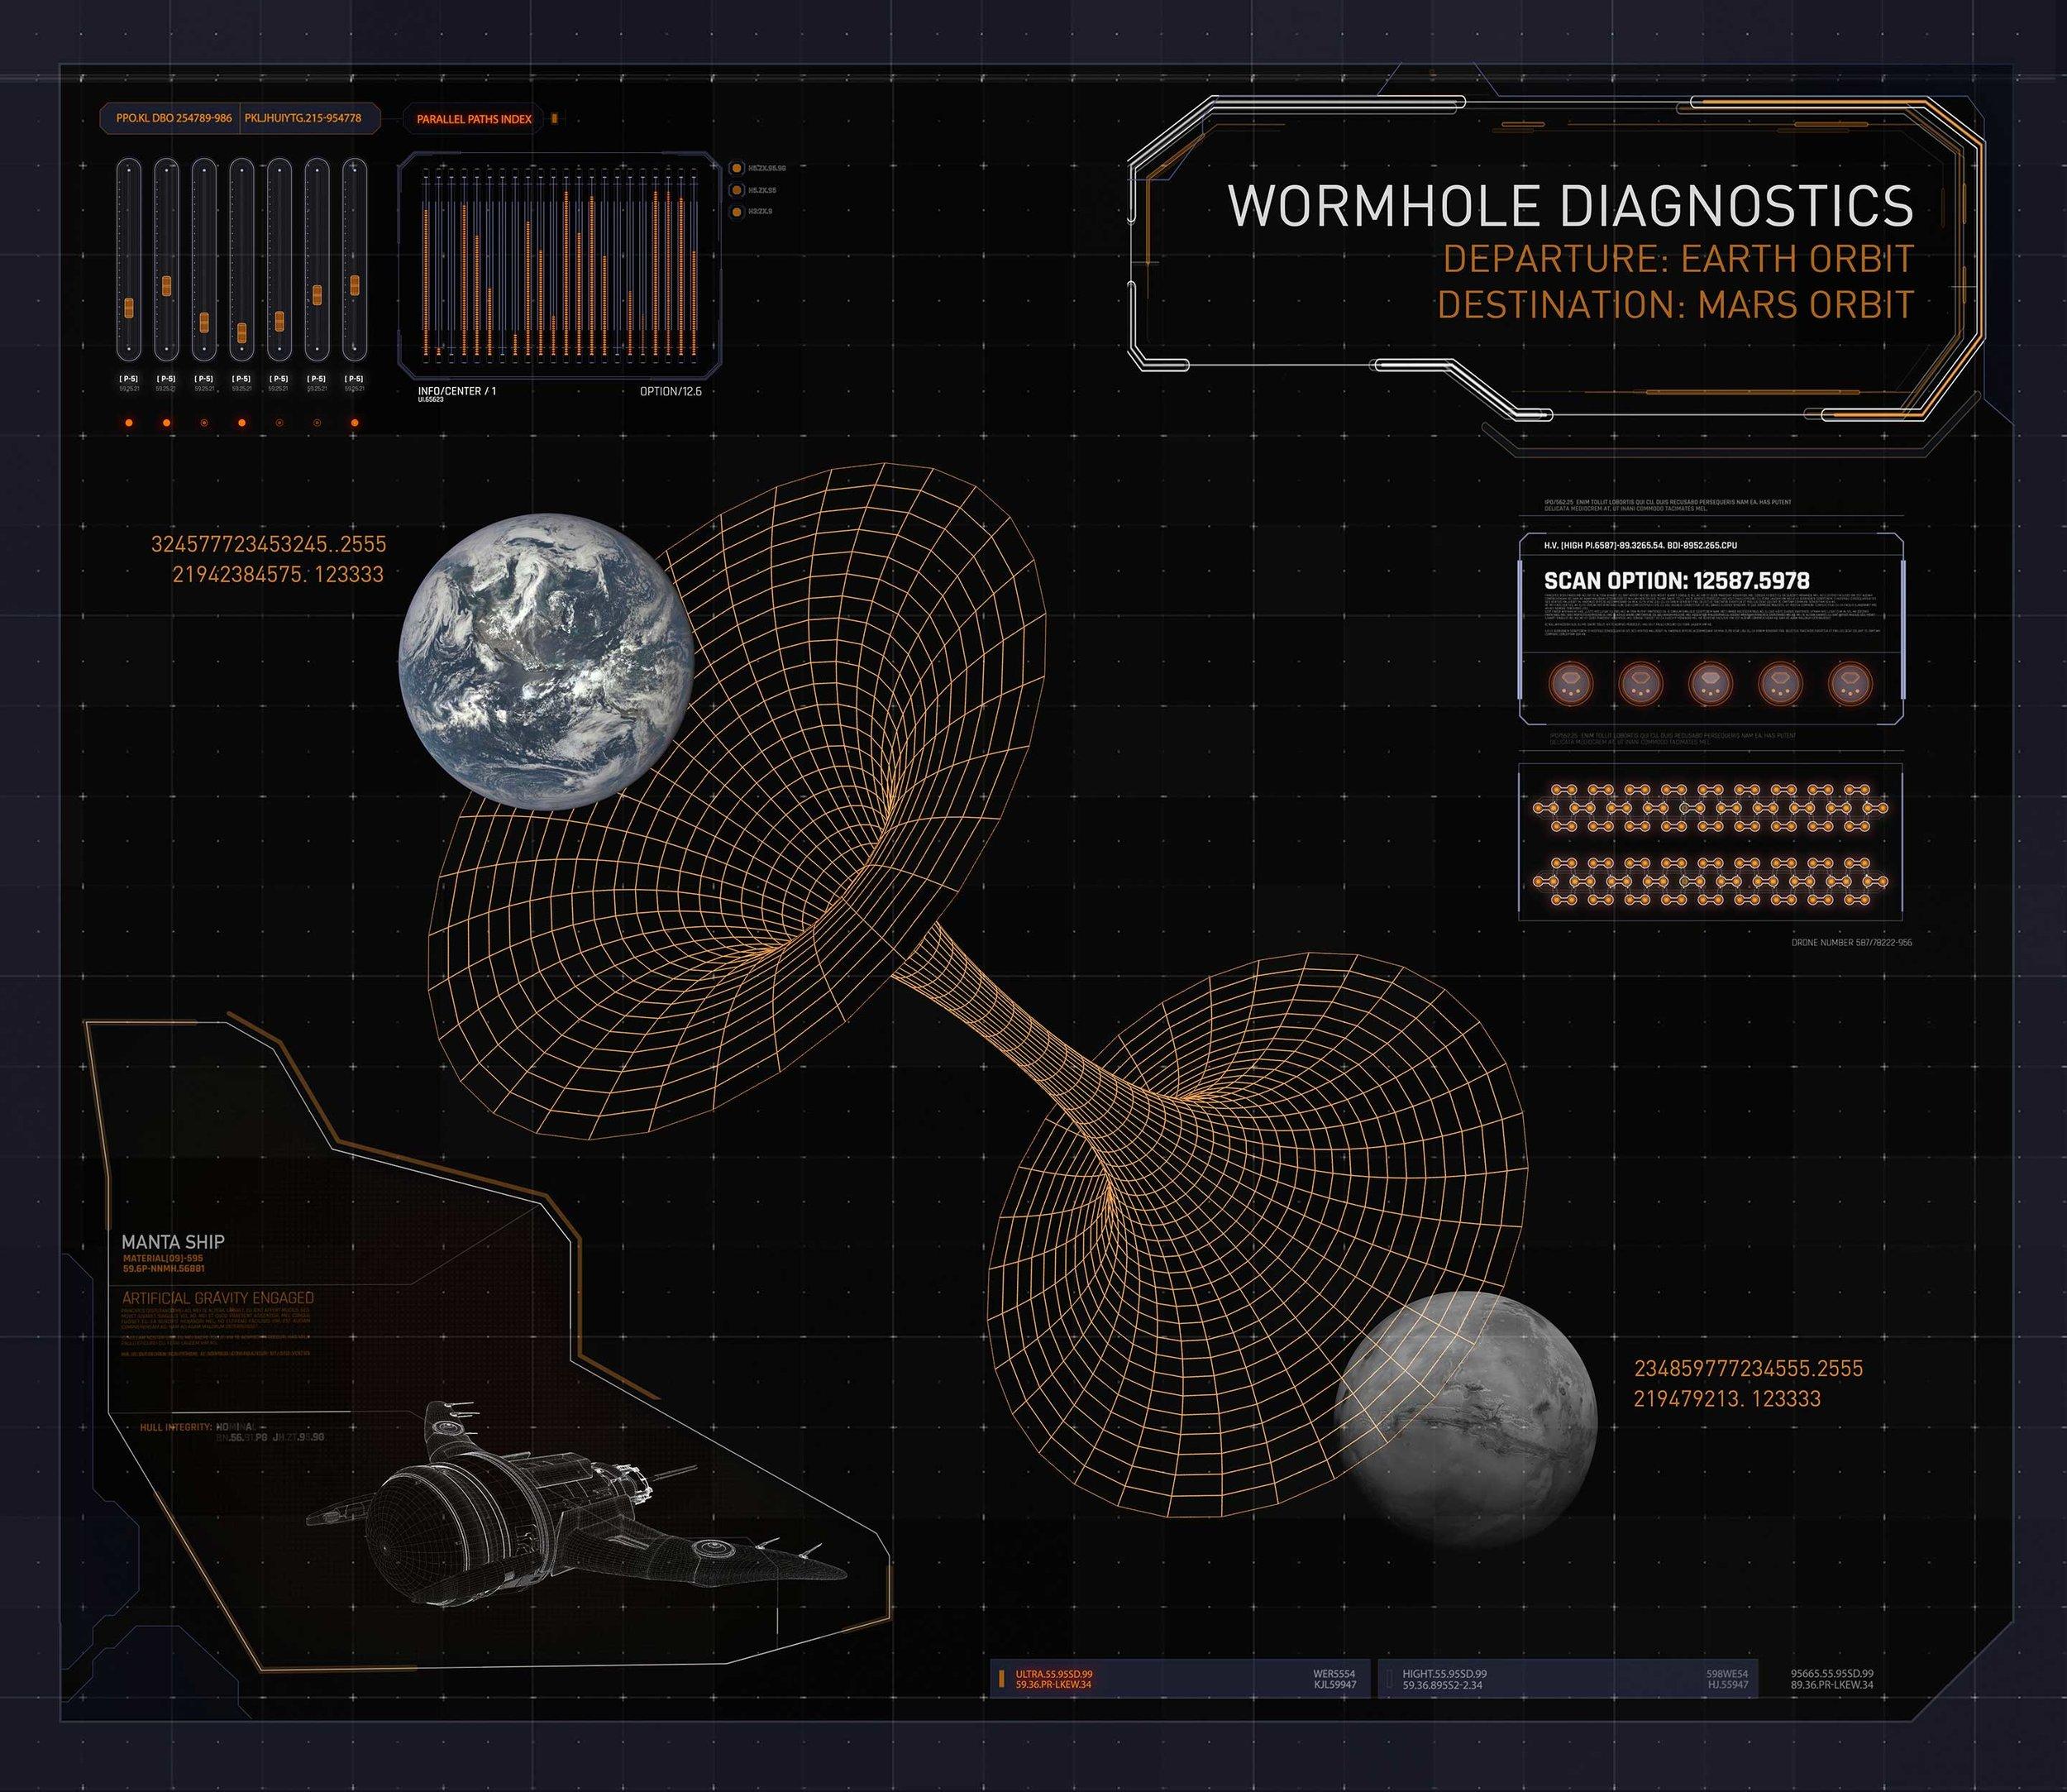 Q2_WallG1_WormholeGraphic.jpg